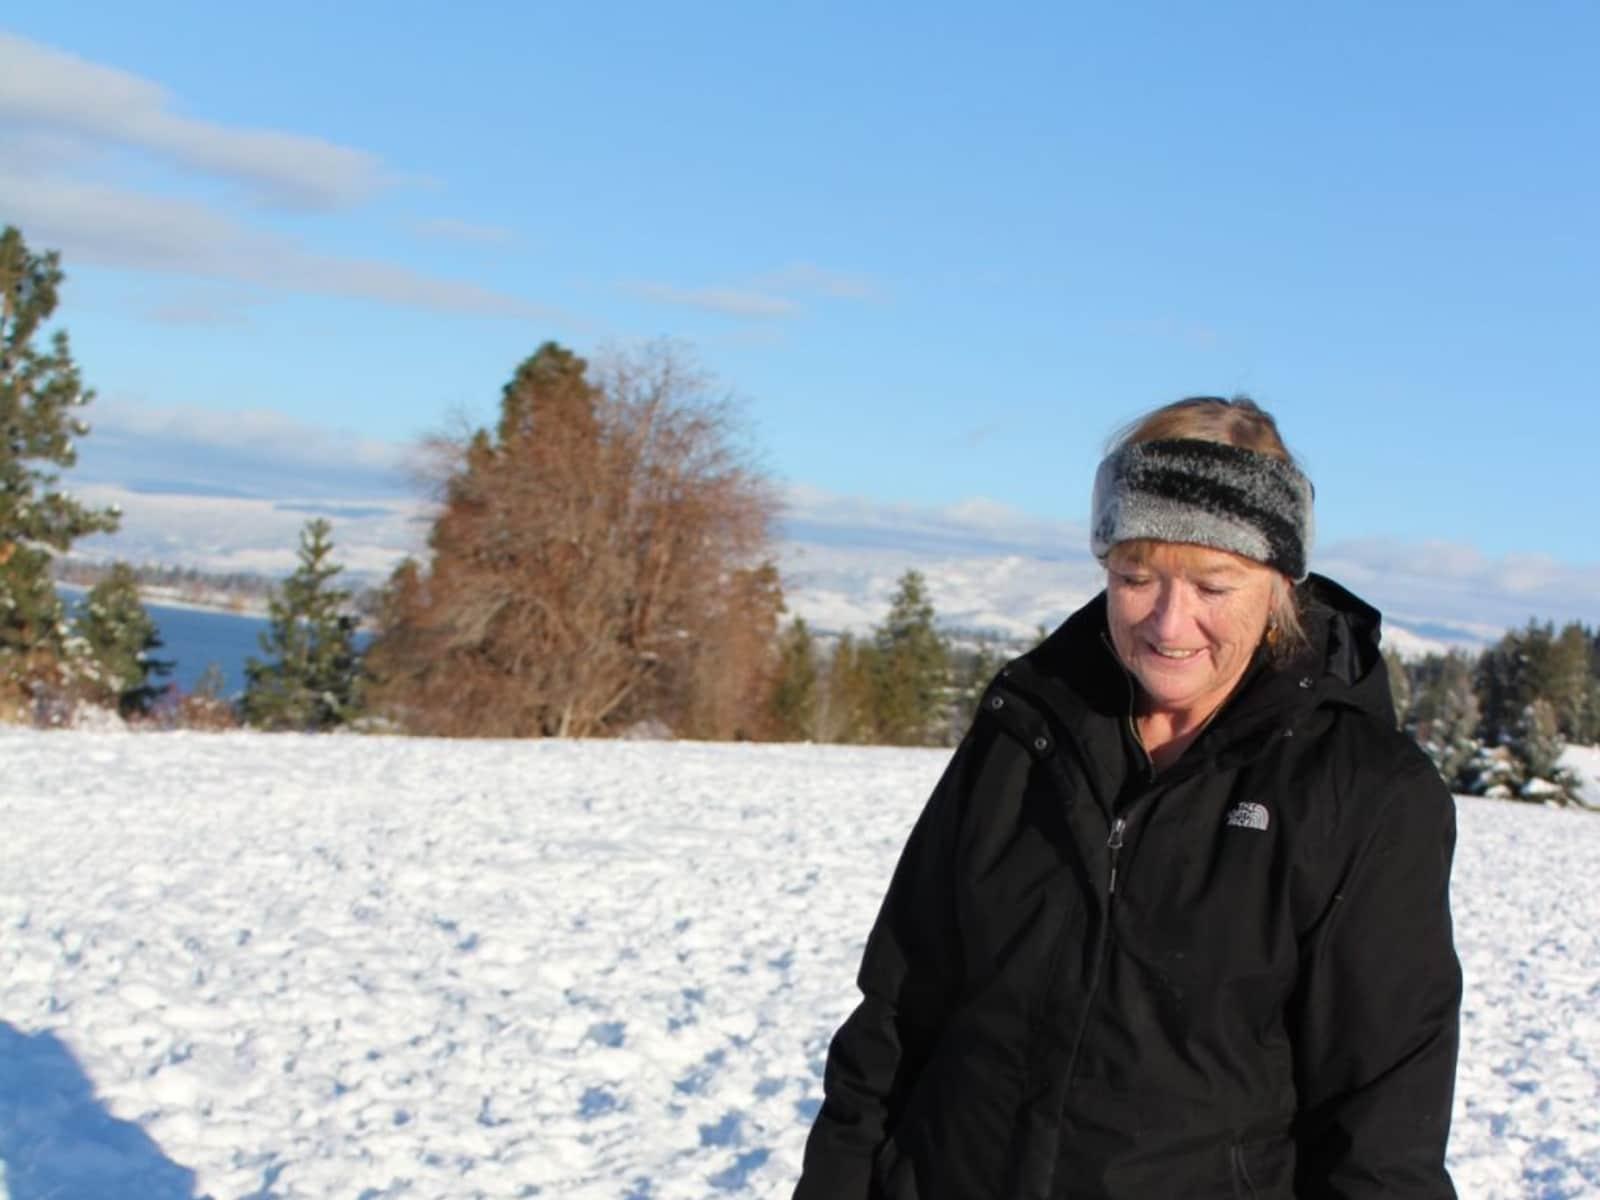 Maureen from Lethbridge, Alberta, Canada